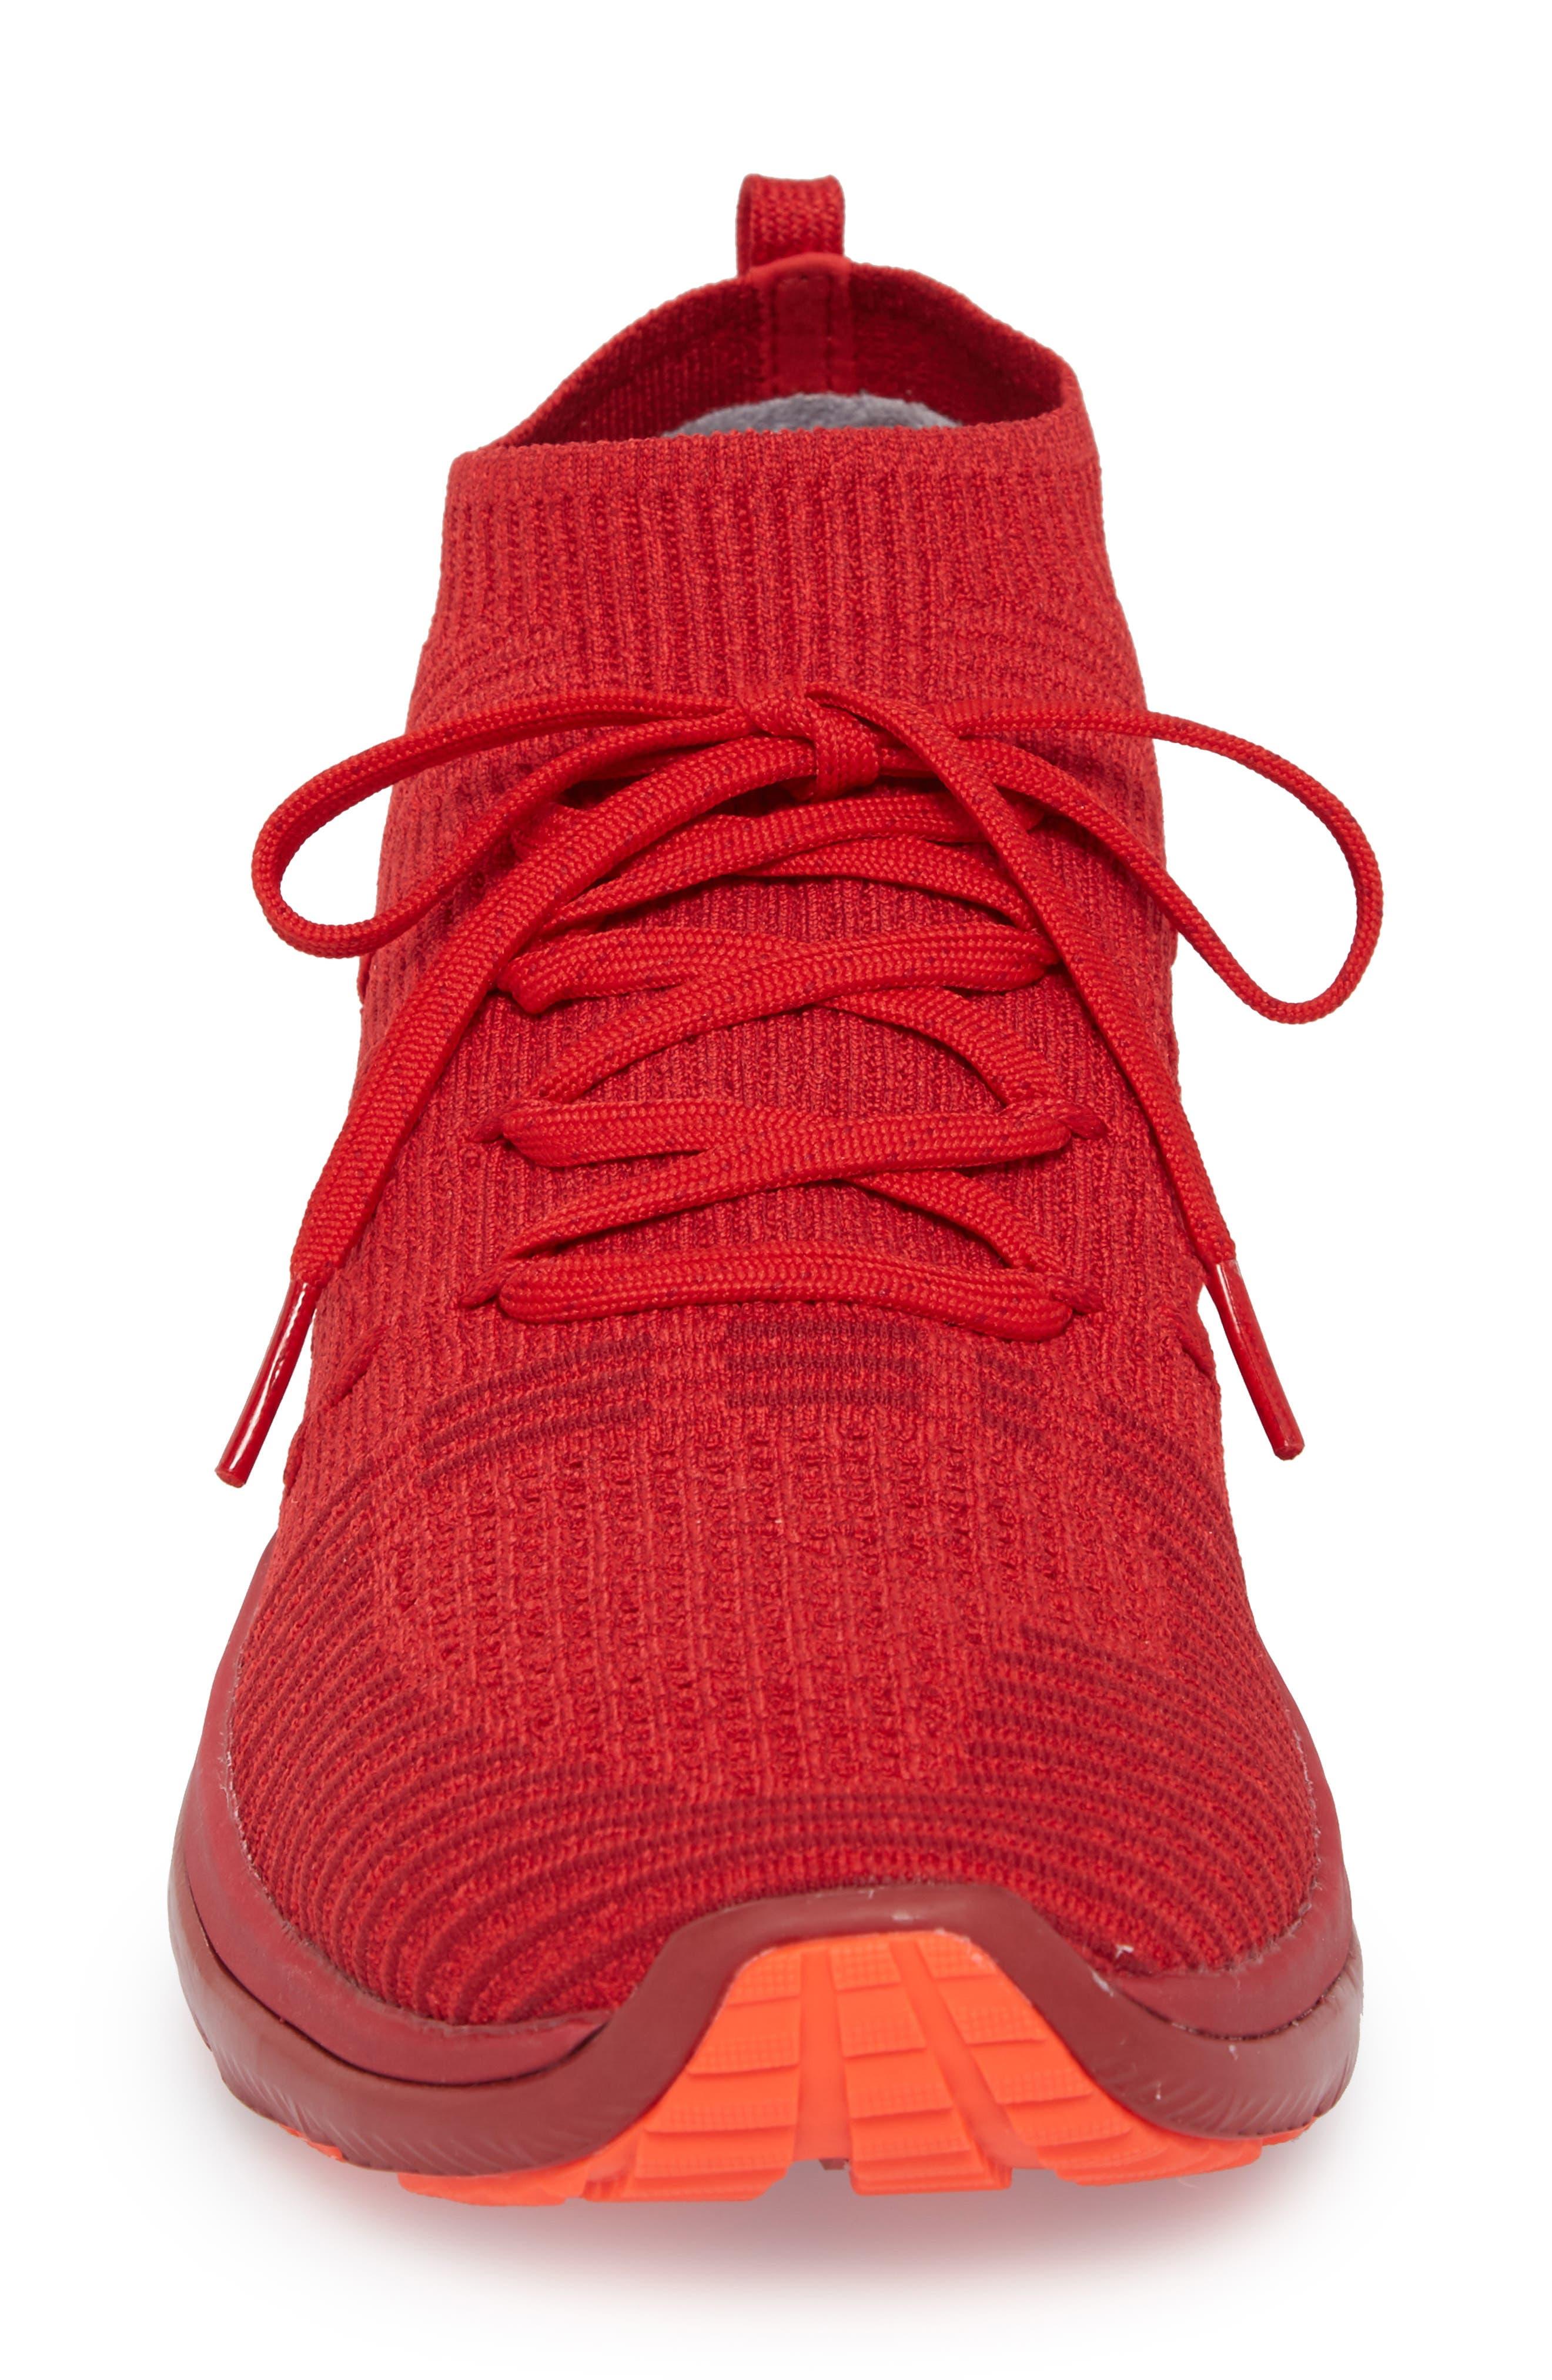 Slingflex Rise Sneaker,                             Alternate thumbnail 4, color,                             Pierce/ Spice Red